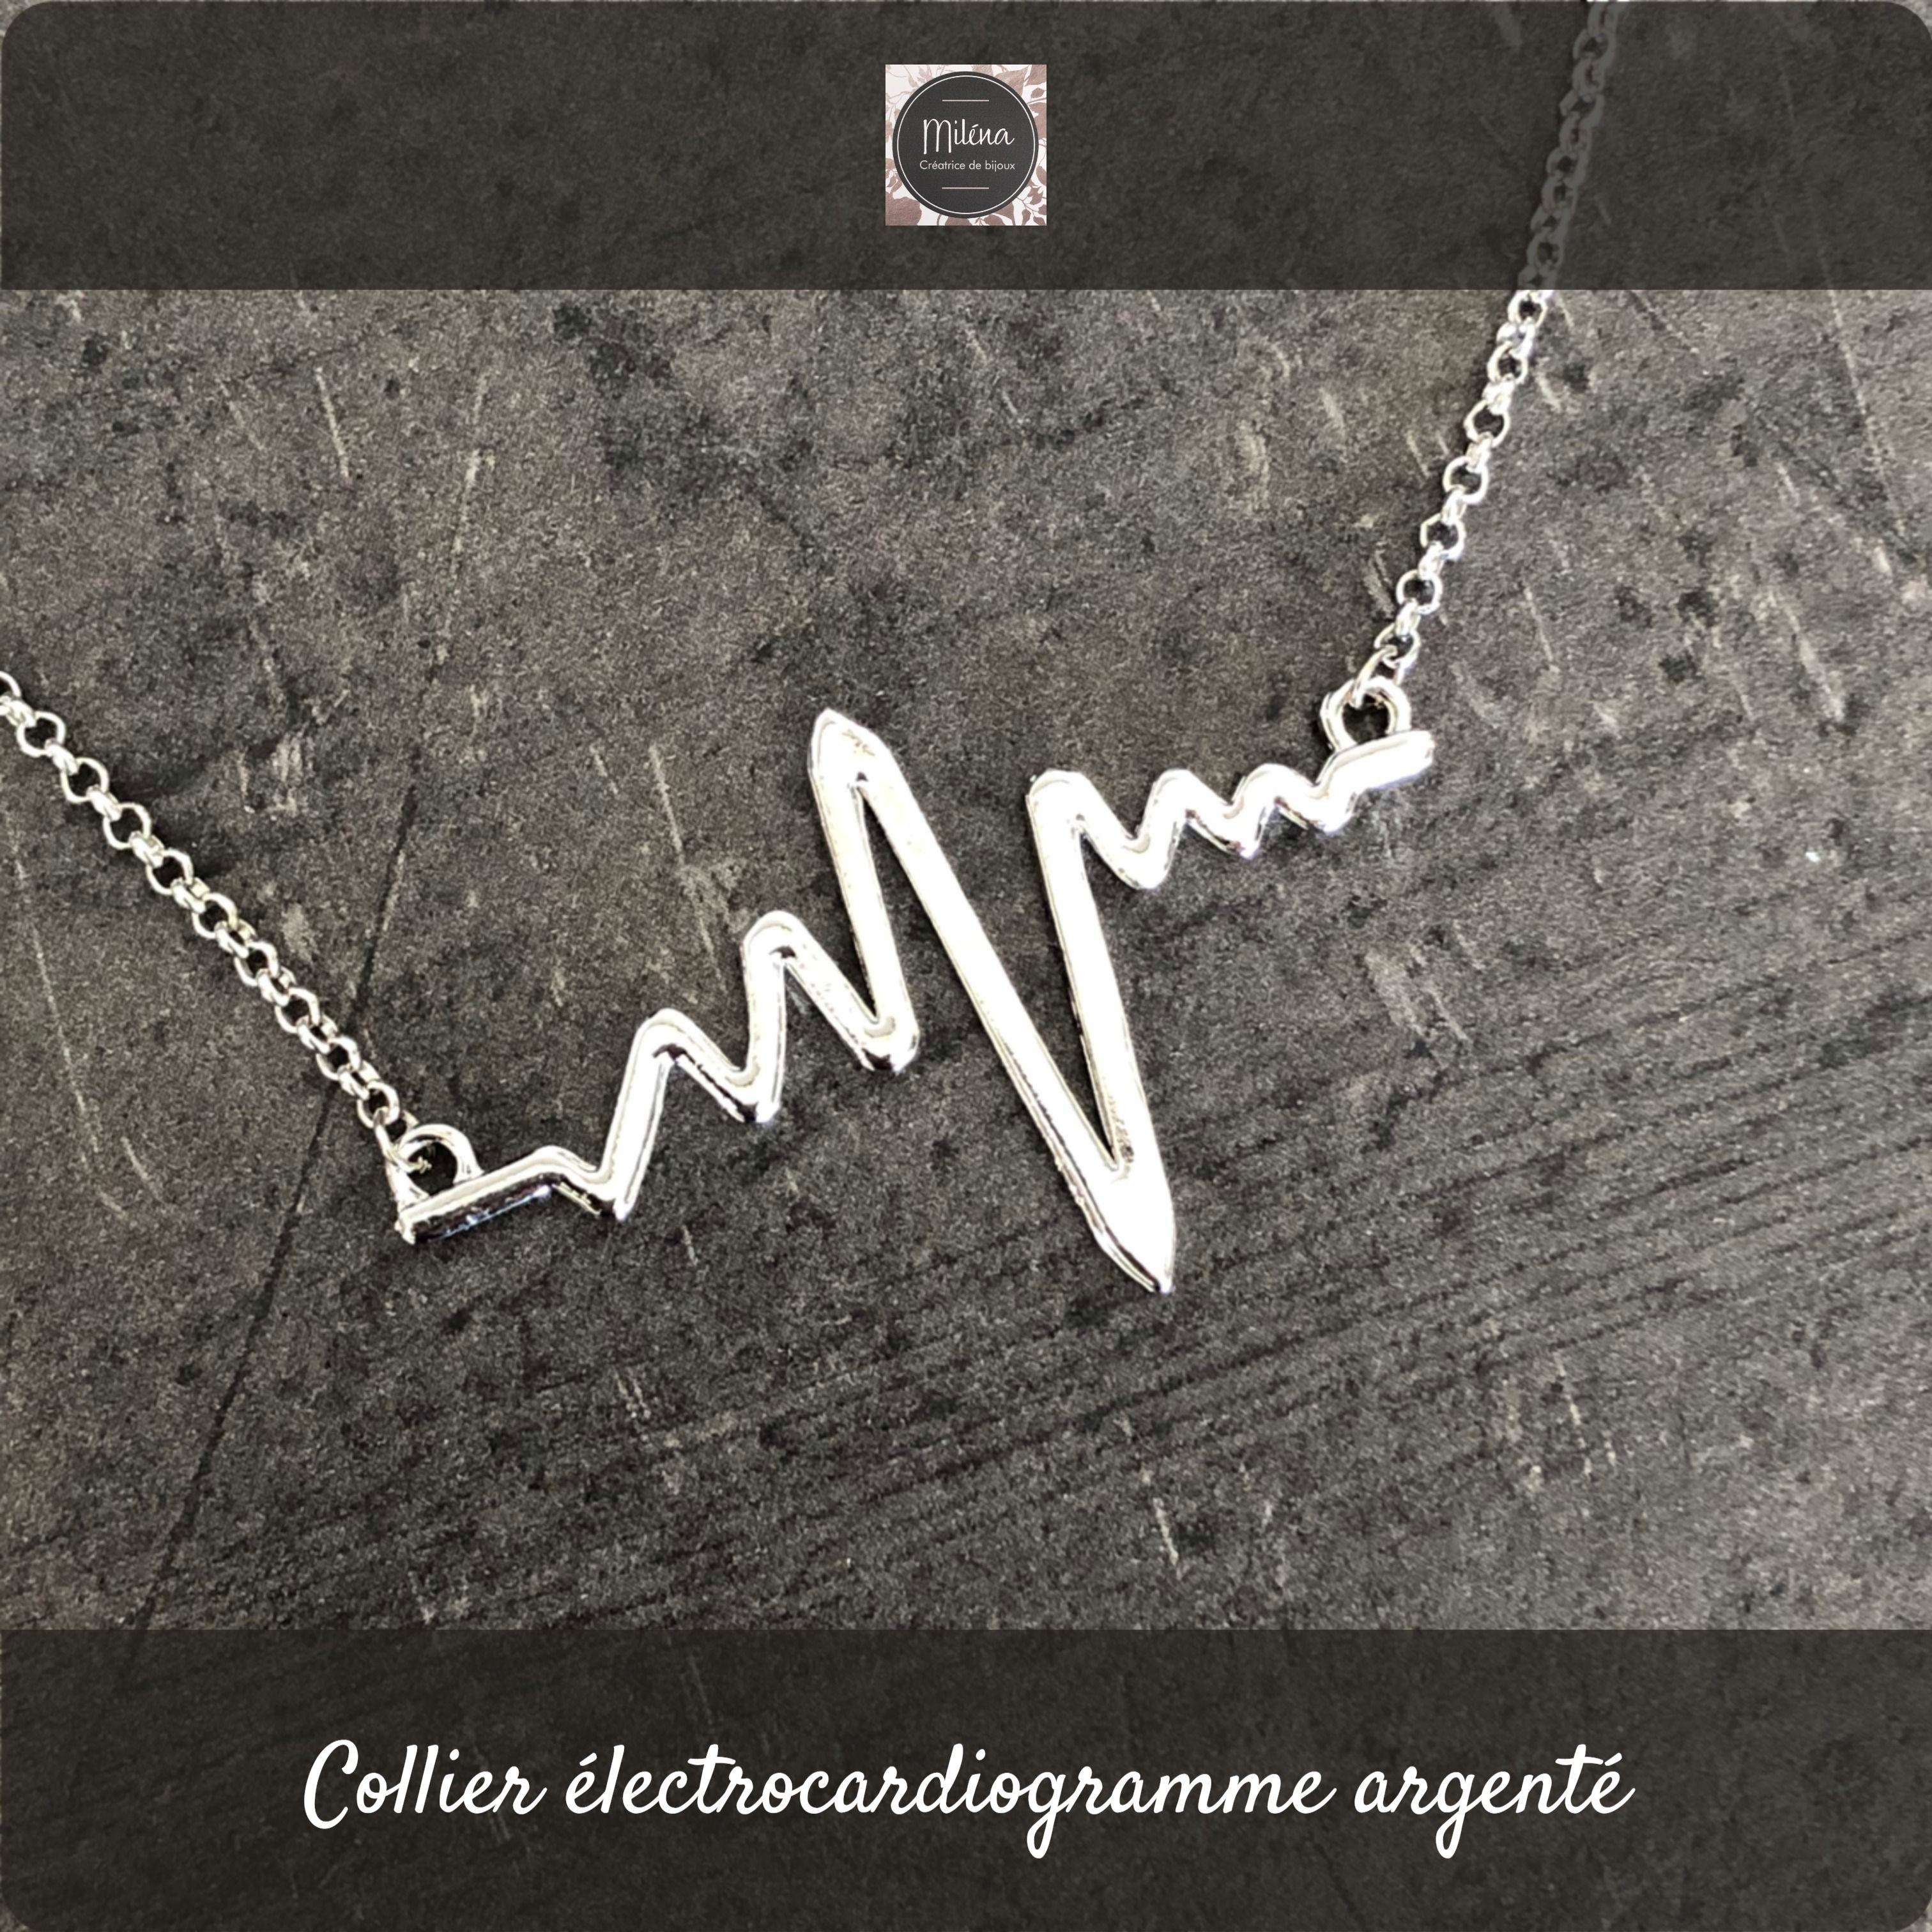 Origami Necklace Silver Electrocardiogram Origami Necklace Silver Necklace Original Necklace